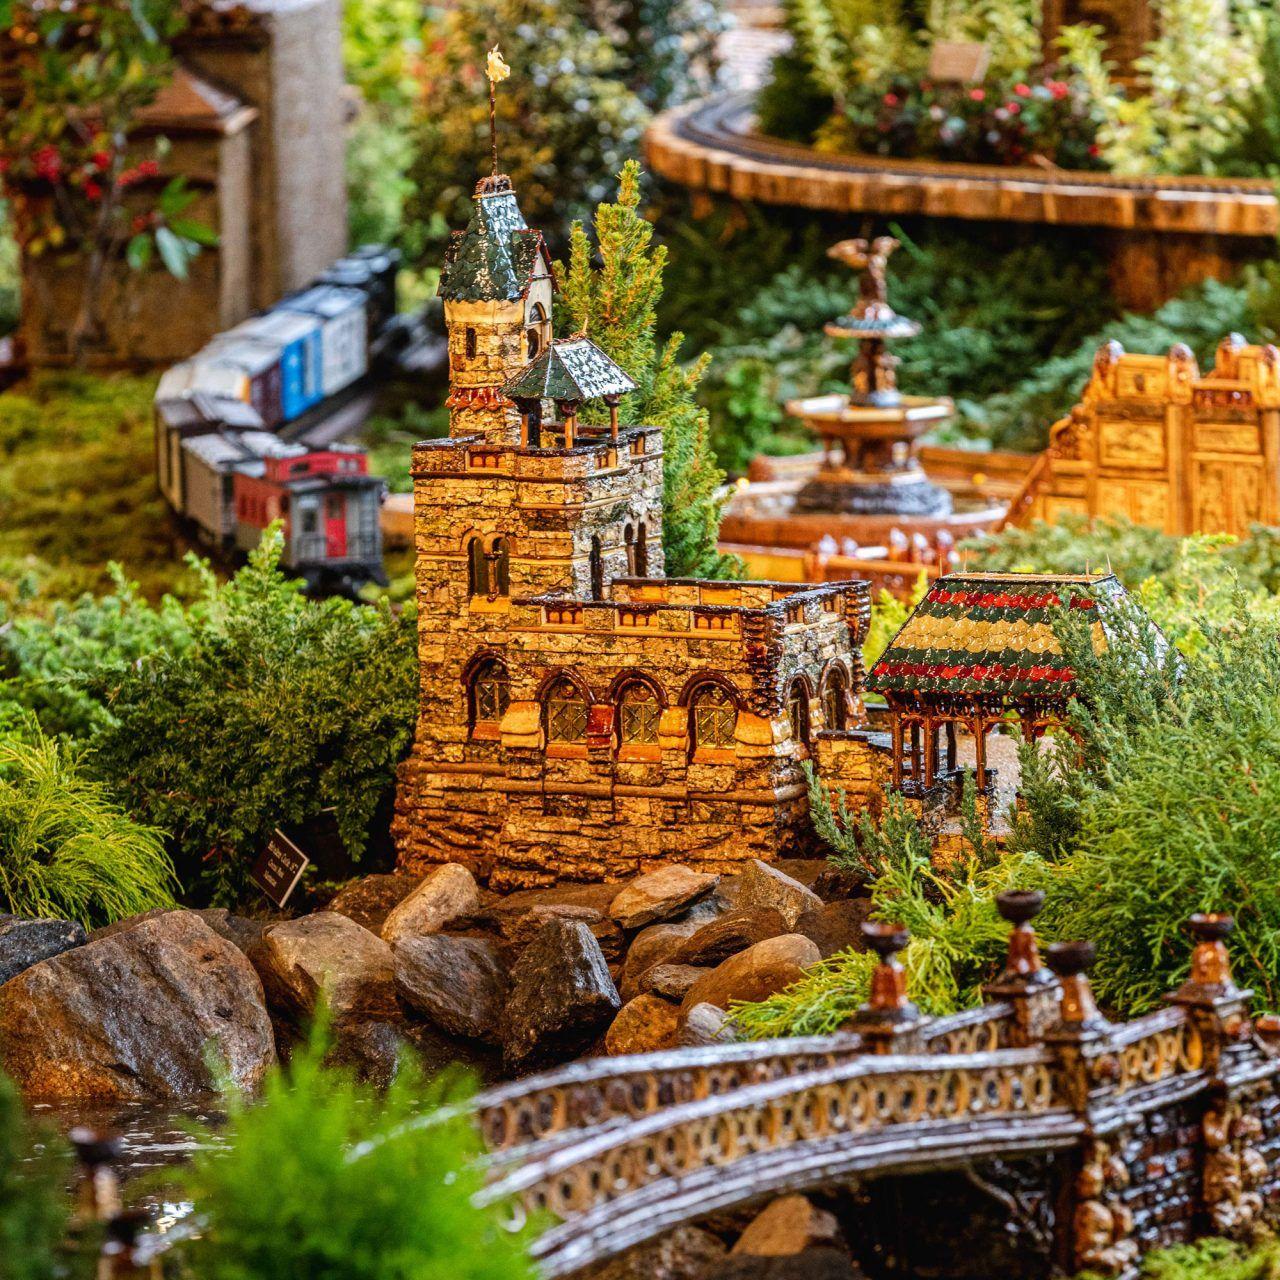 d7d458c4dce6d19359357cf27d480ab3 - Holiday Train Show Ny Botanical Gardens